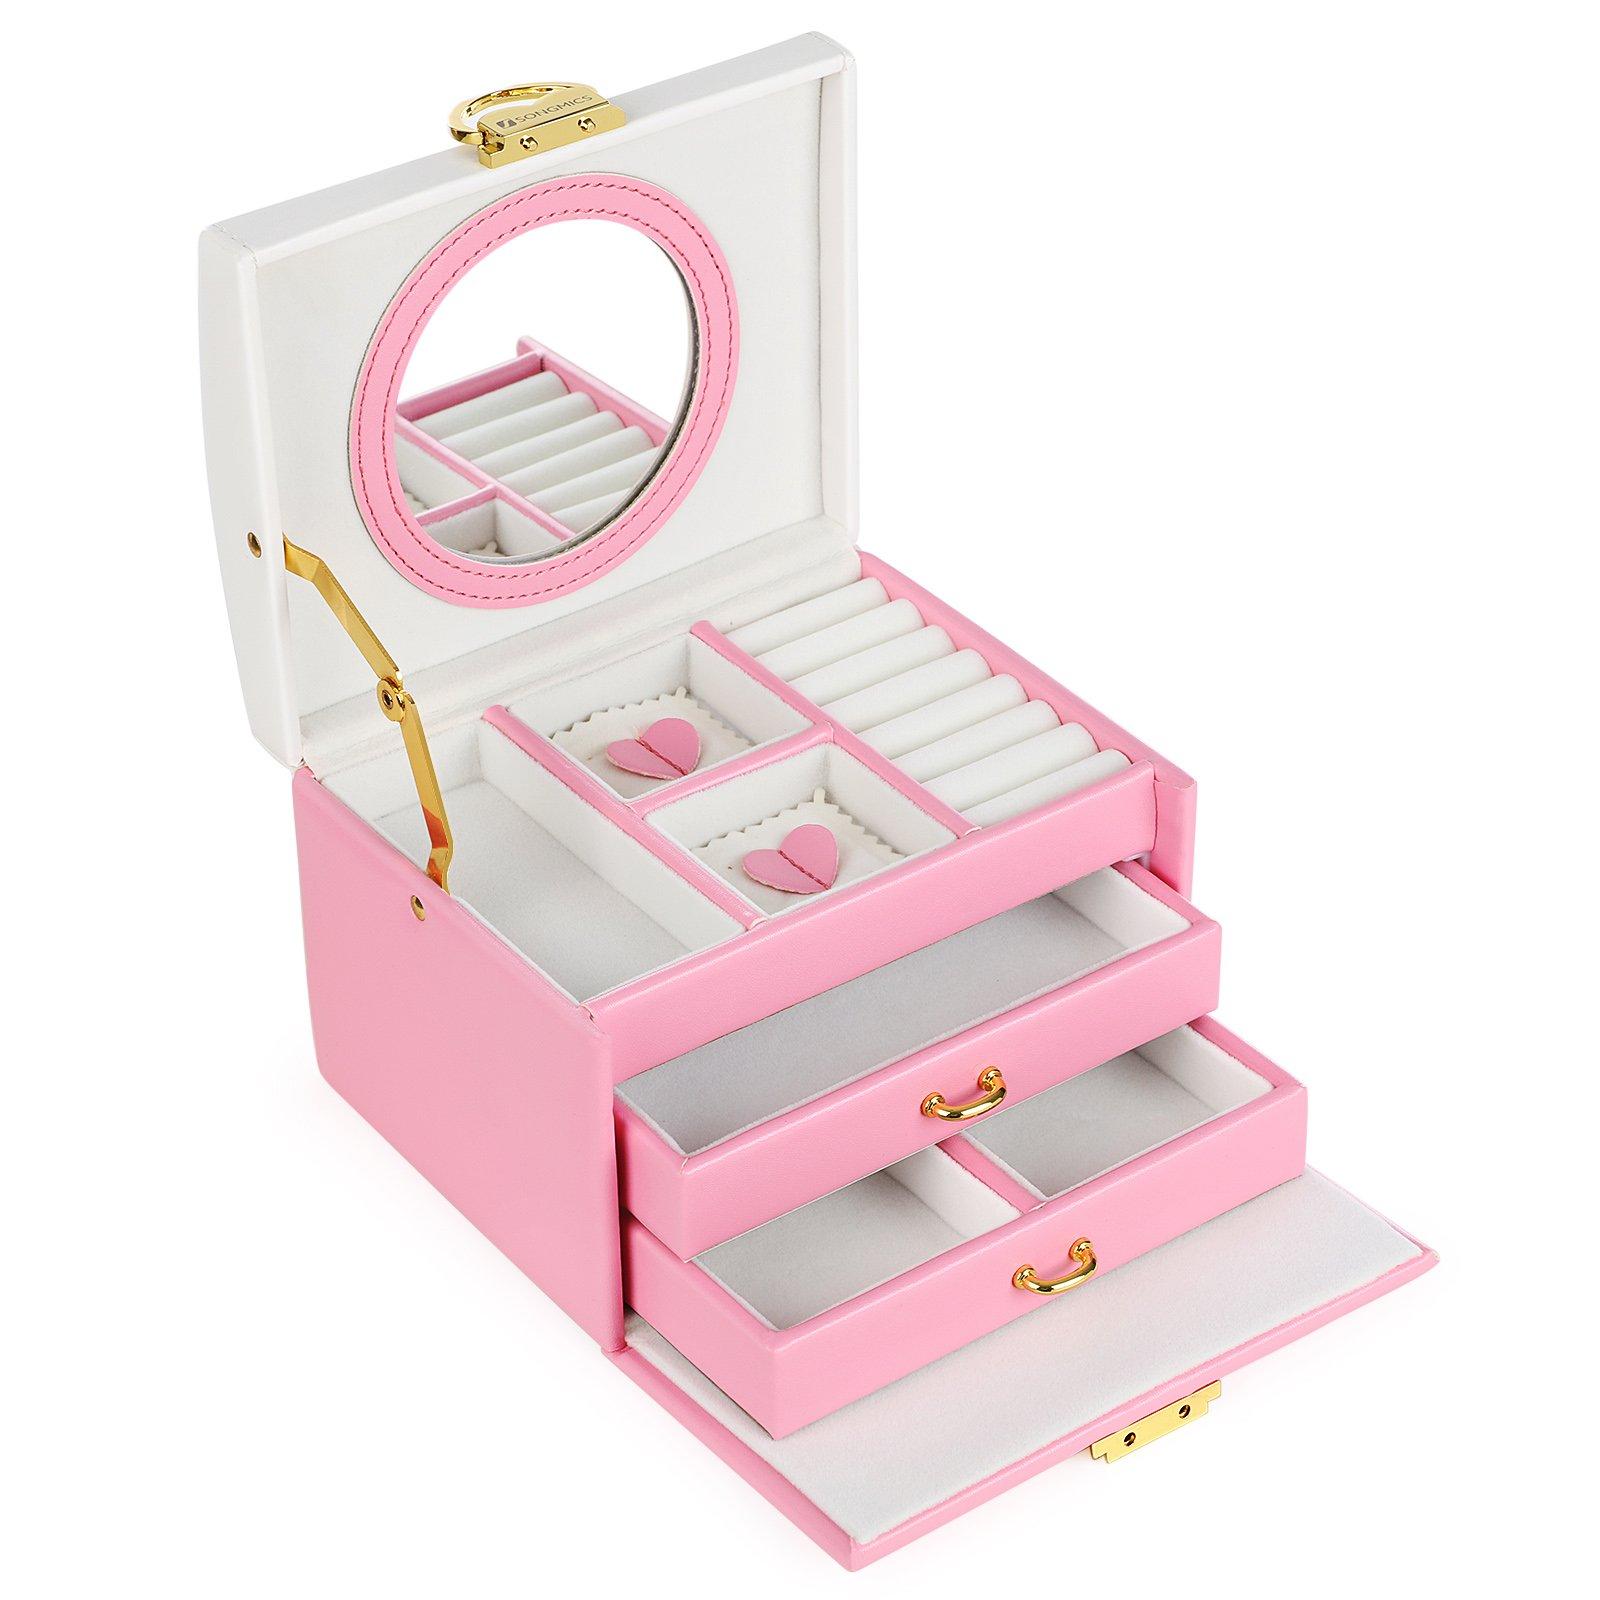 SONGMICS Jewelry Box Bowknot Mirrored Compact Travel Case Gift Kids Girls Women Pink White UJBC115P